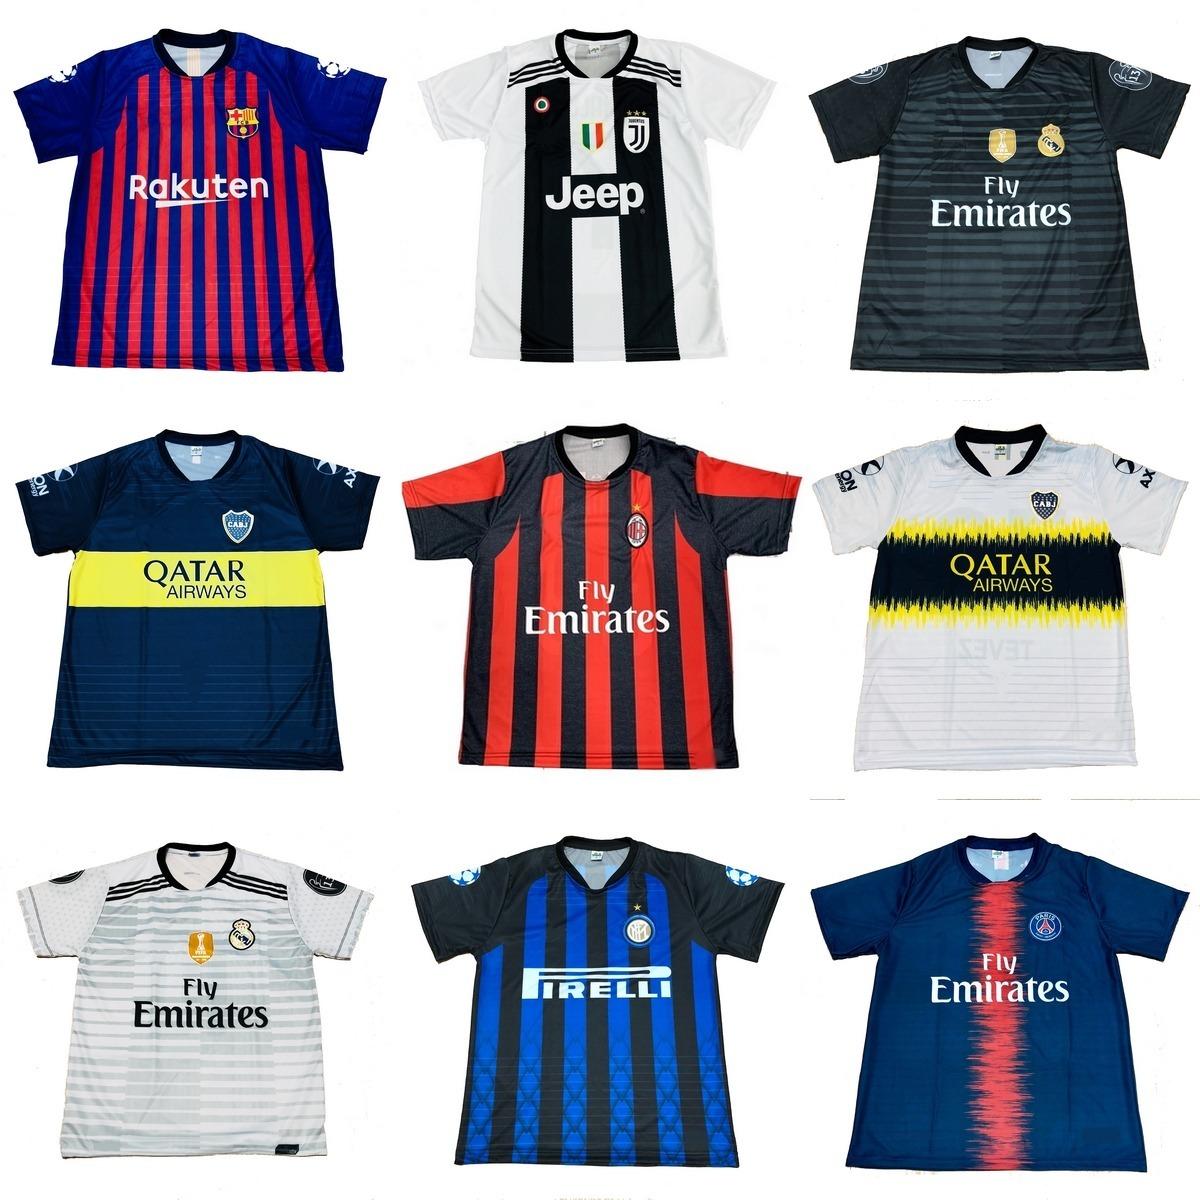 2944dd8ad0796 10 Camisas Futebol 150 Modelos Atacado 2019 Barato Time - R  185